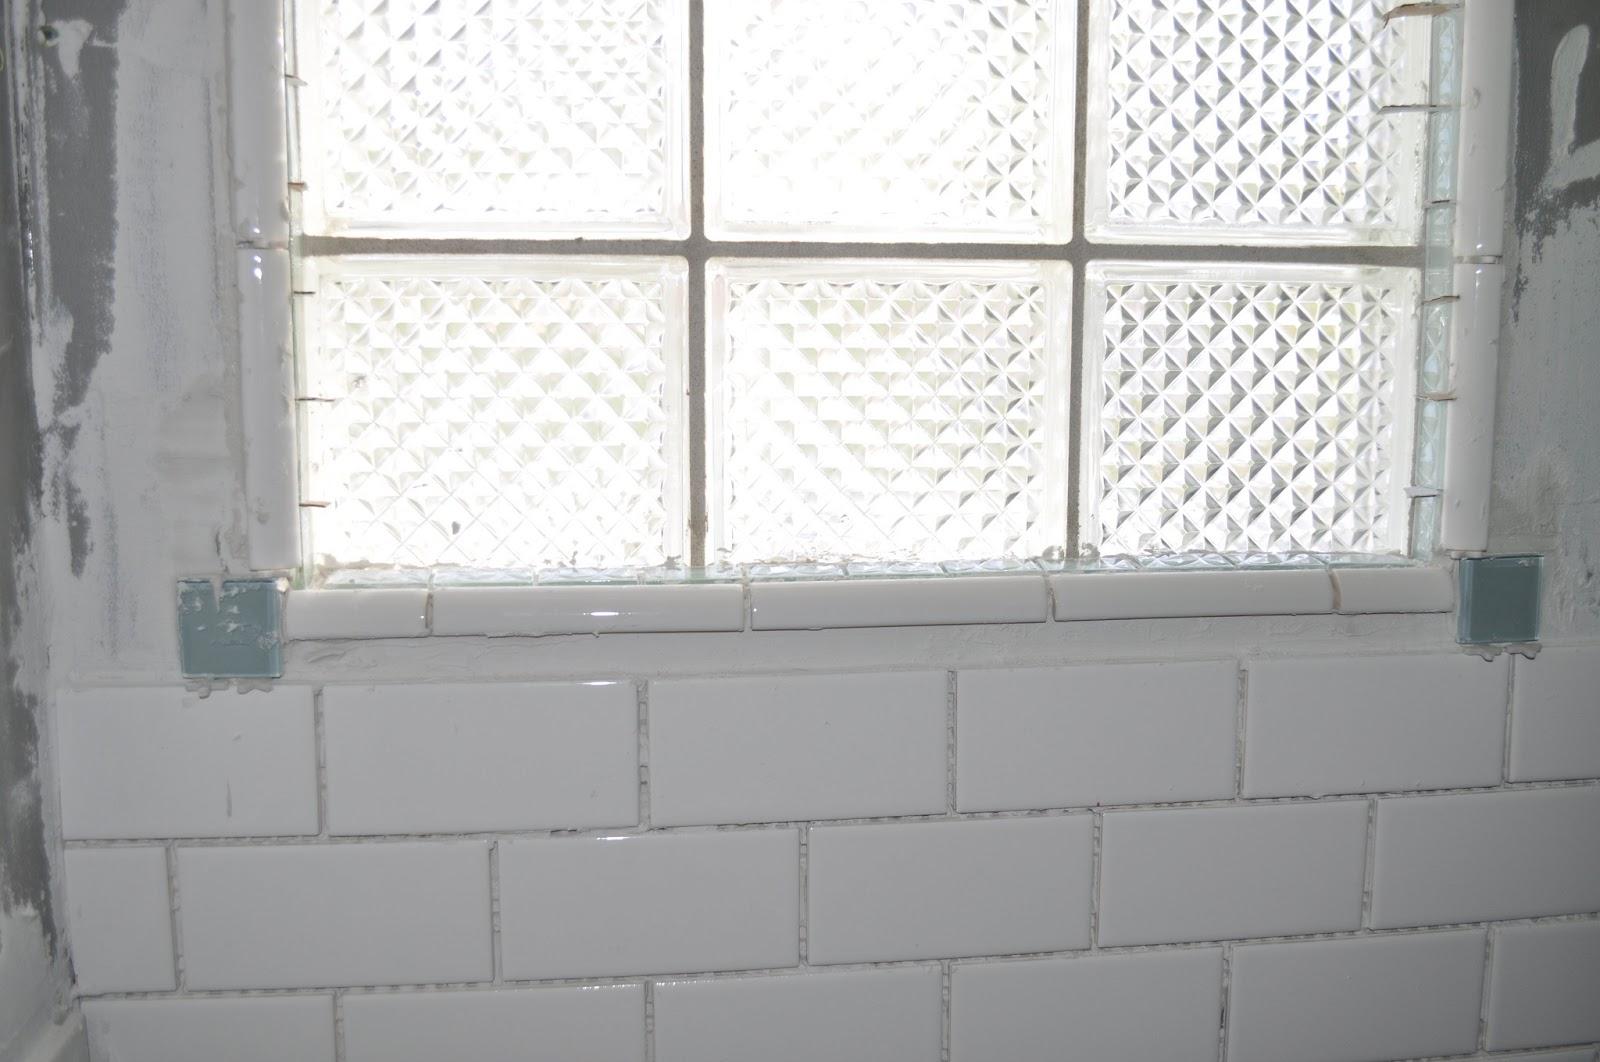 Carri Us Home: Bathroom Tile Love